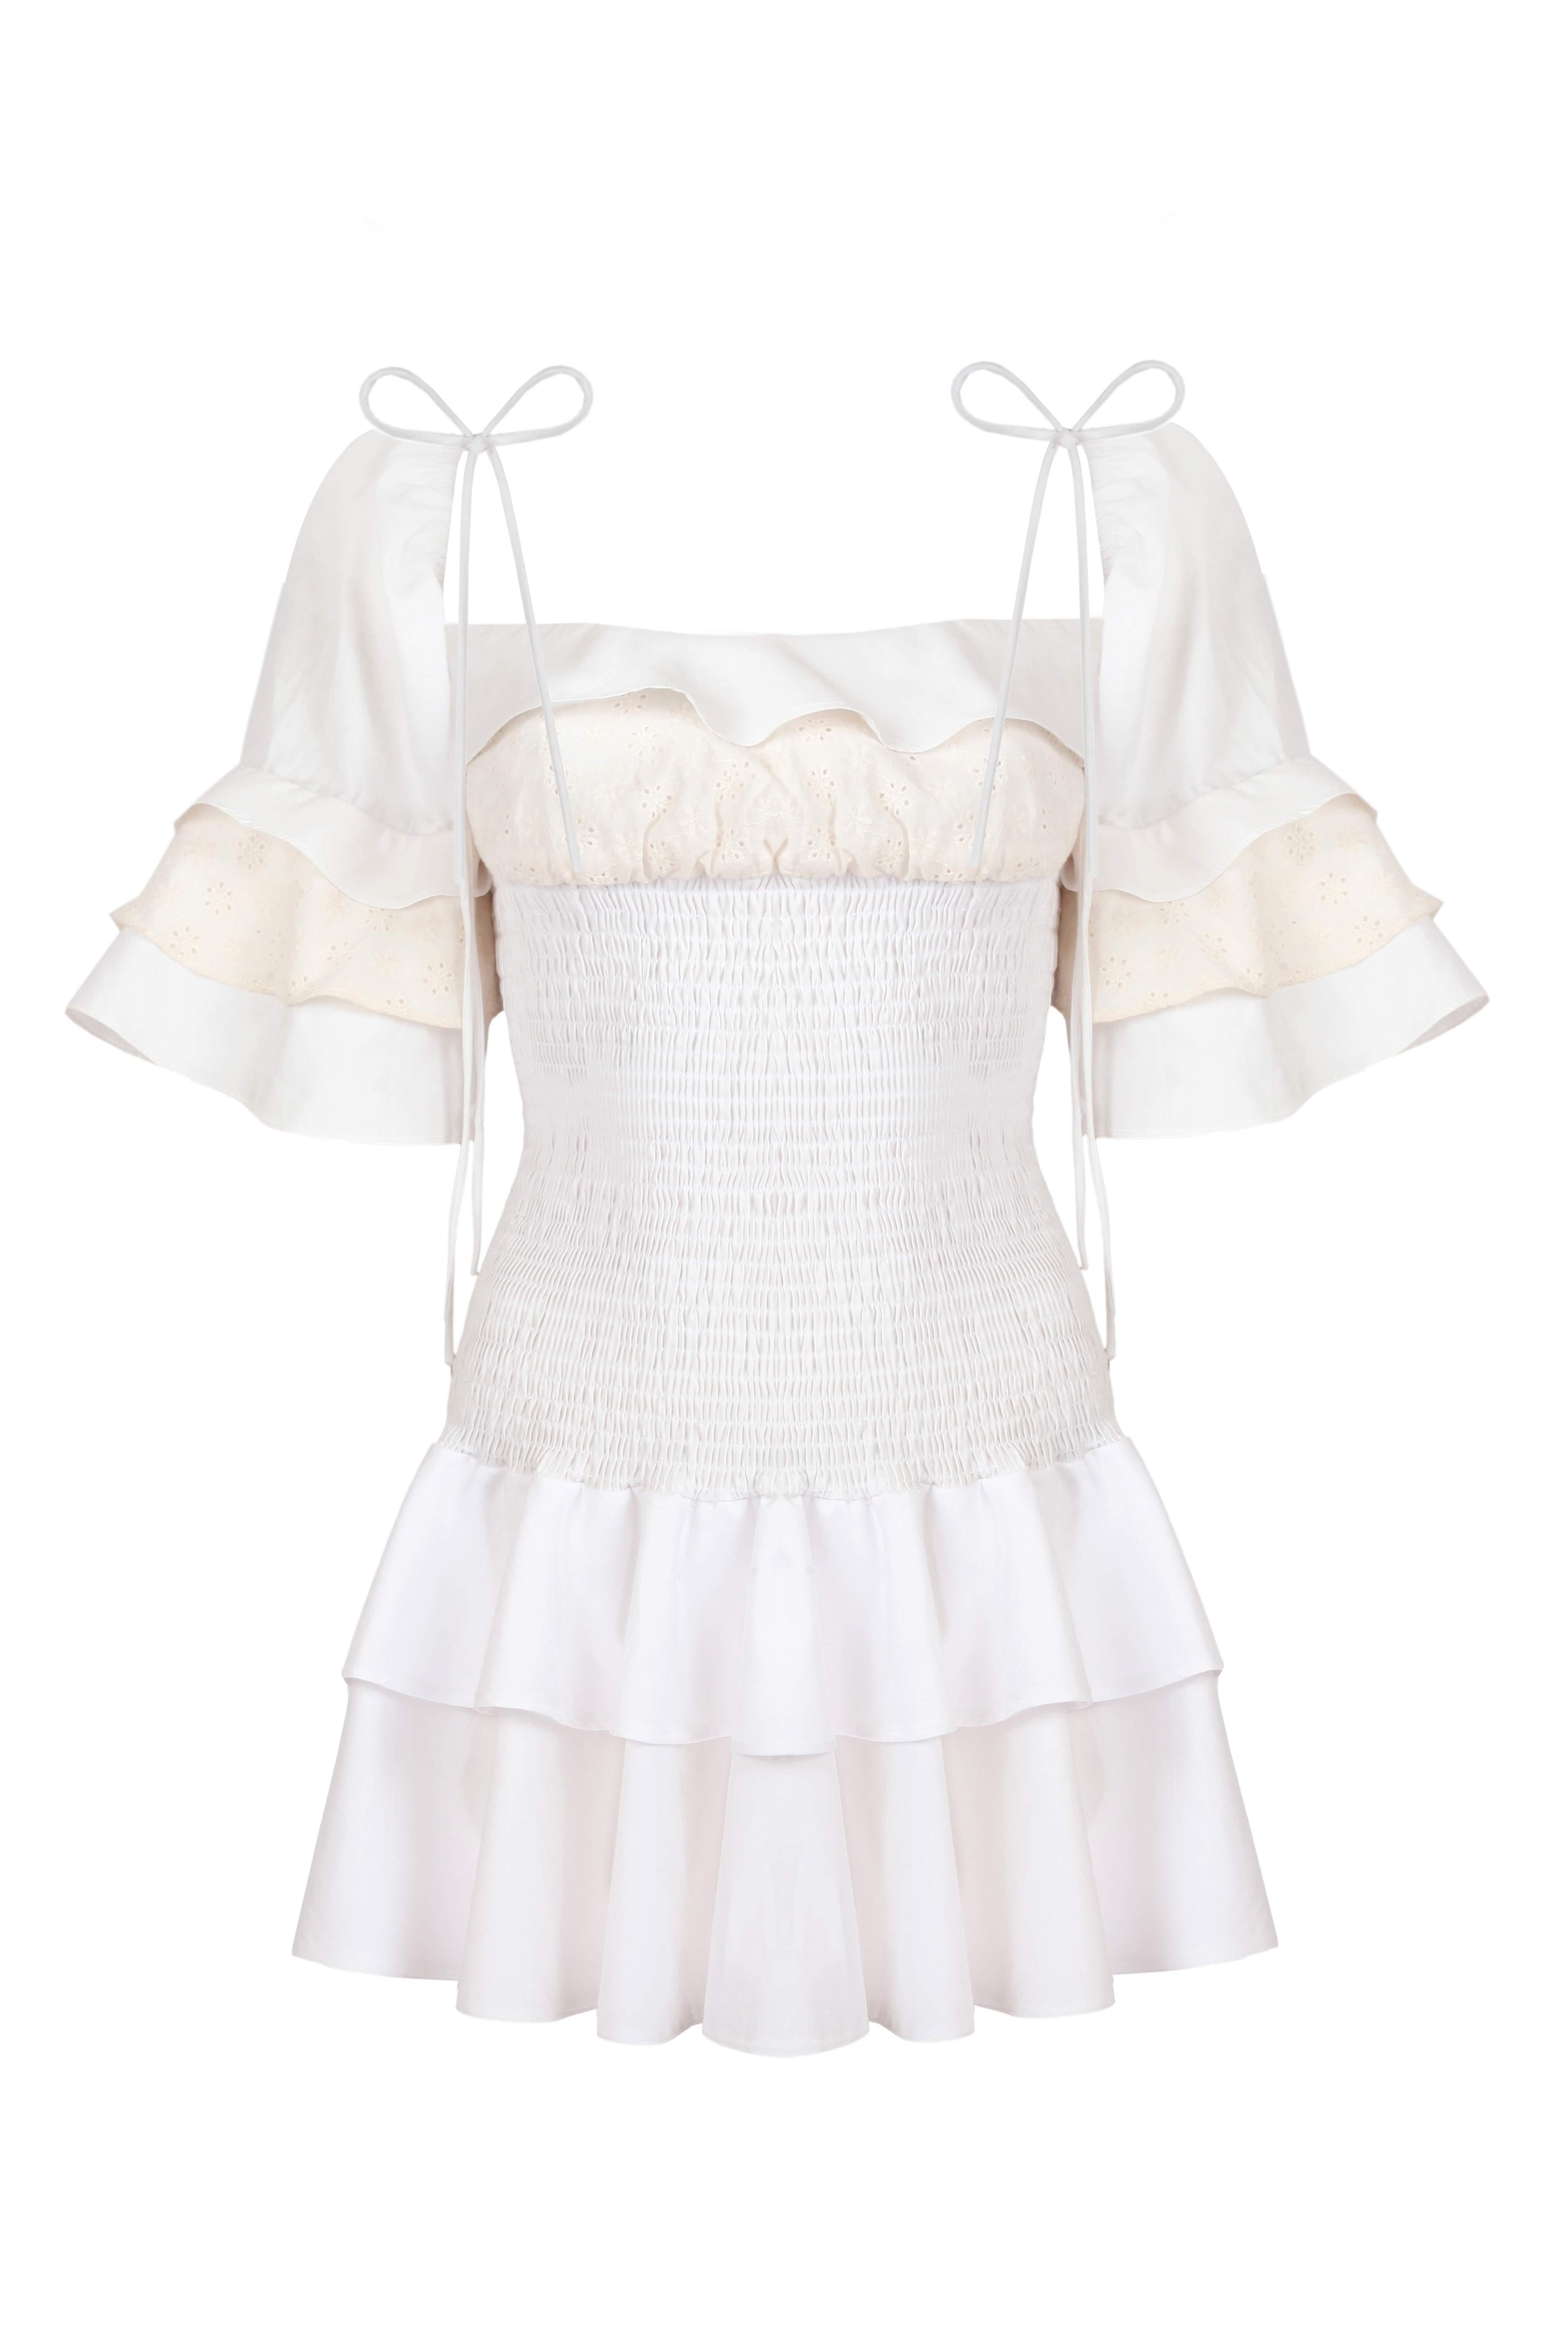 Ravenna Dress